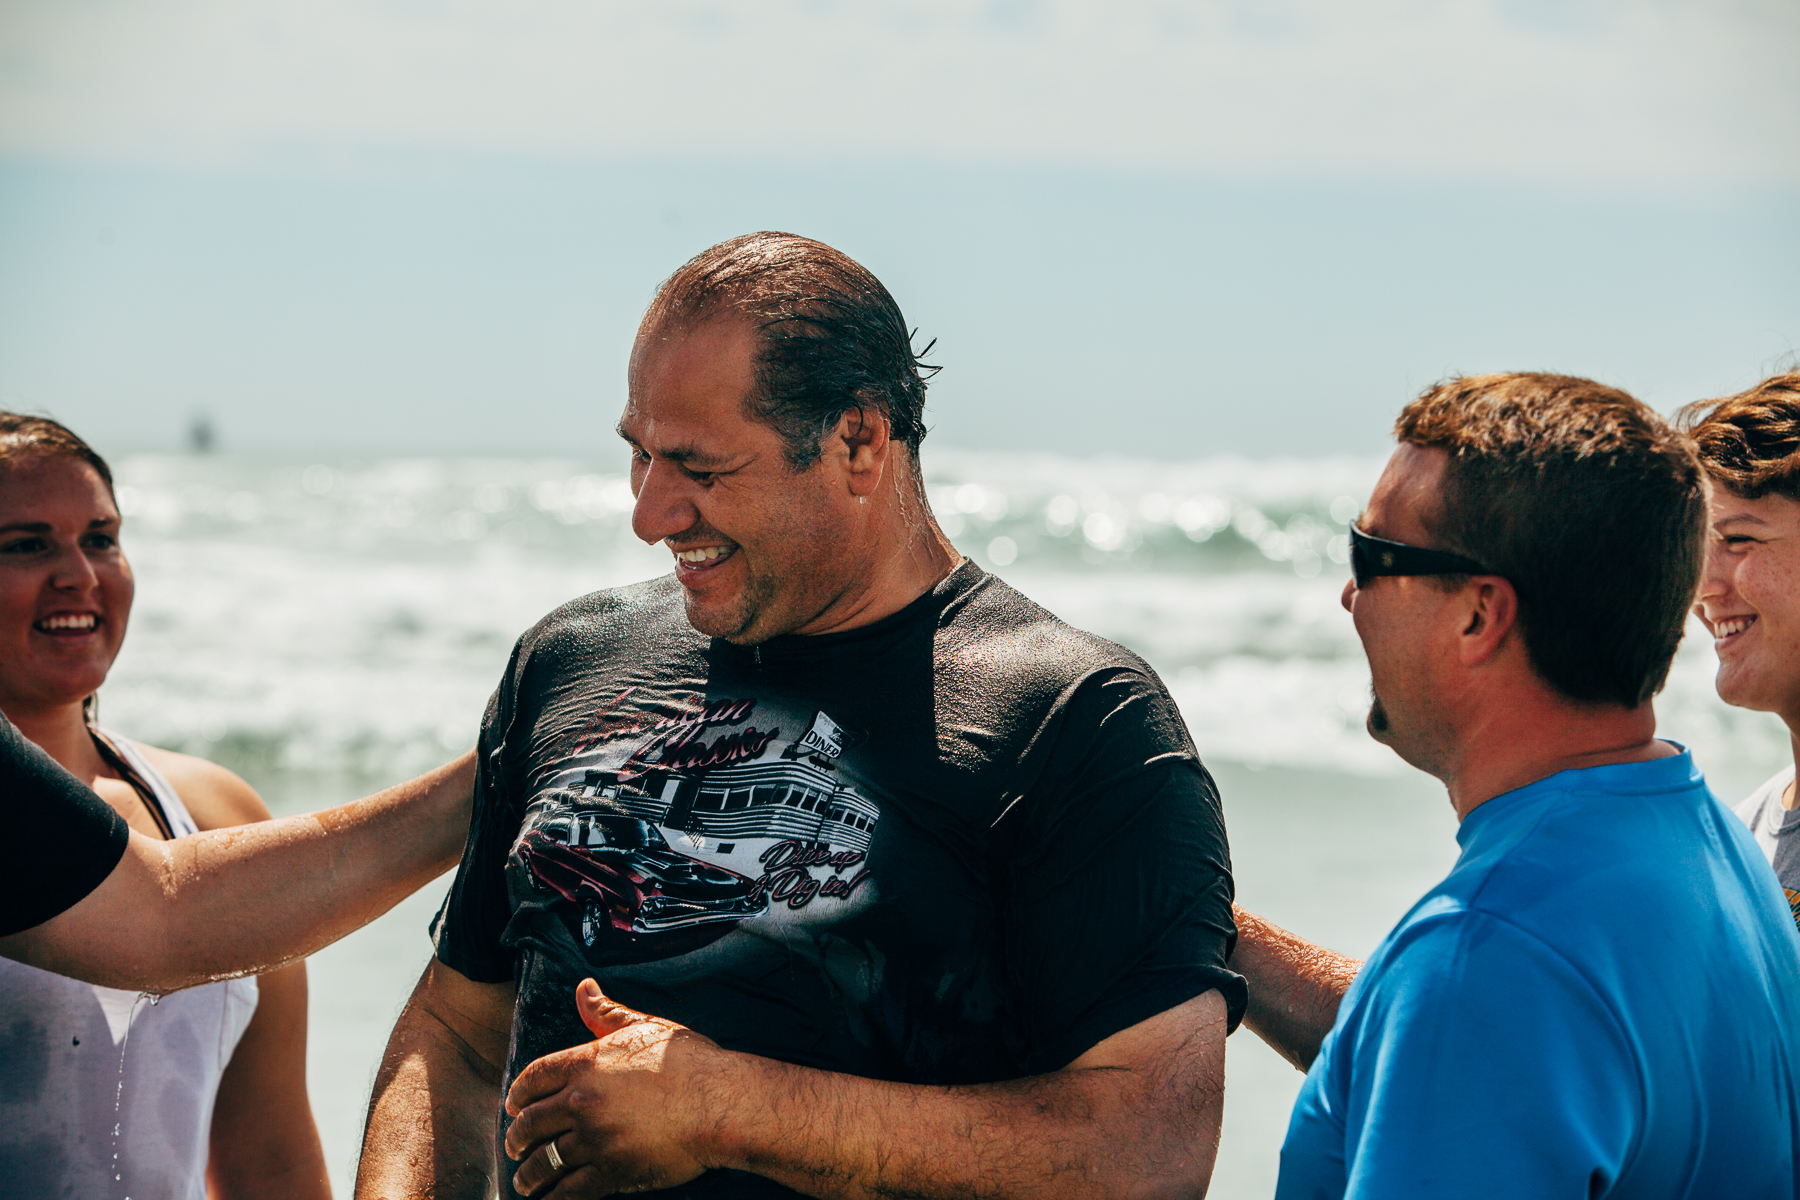 Beach_Baptism_2015_41.jpg